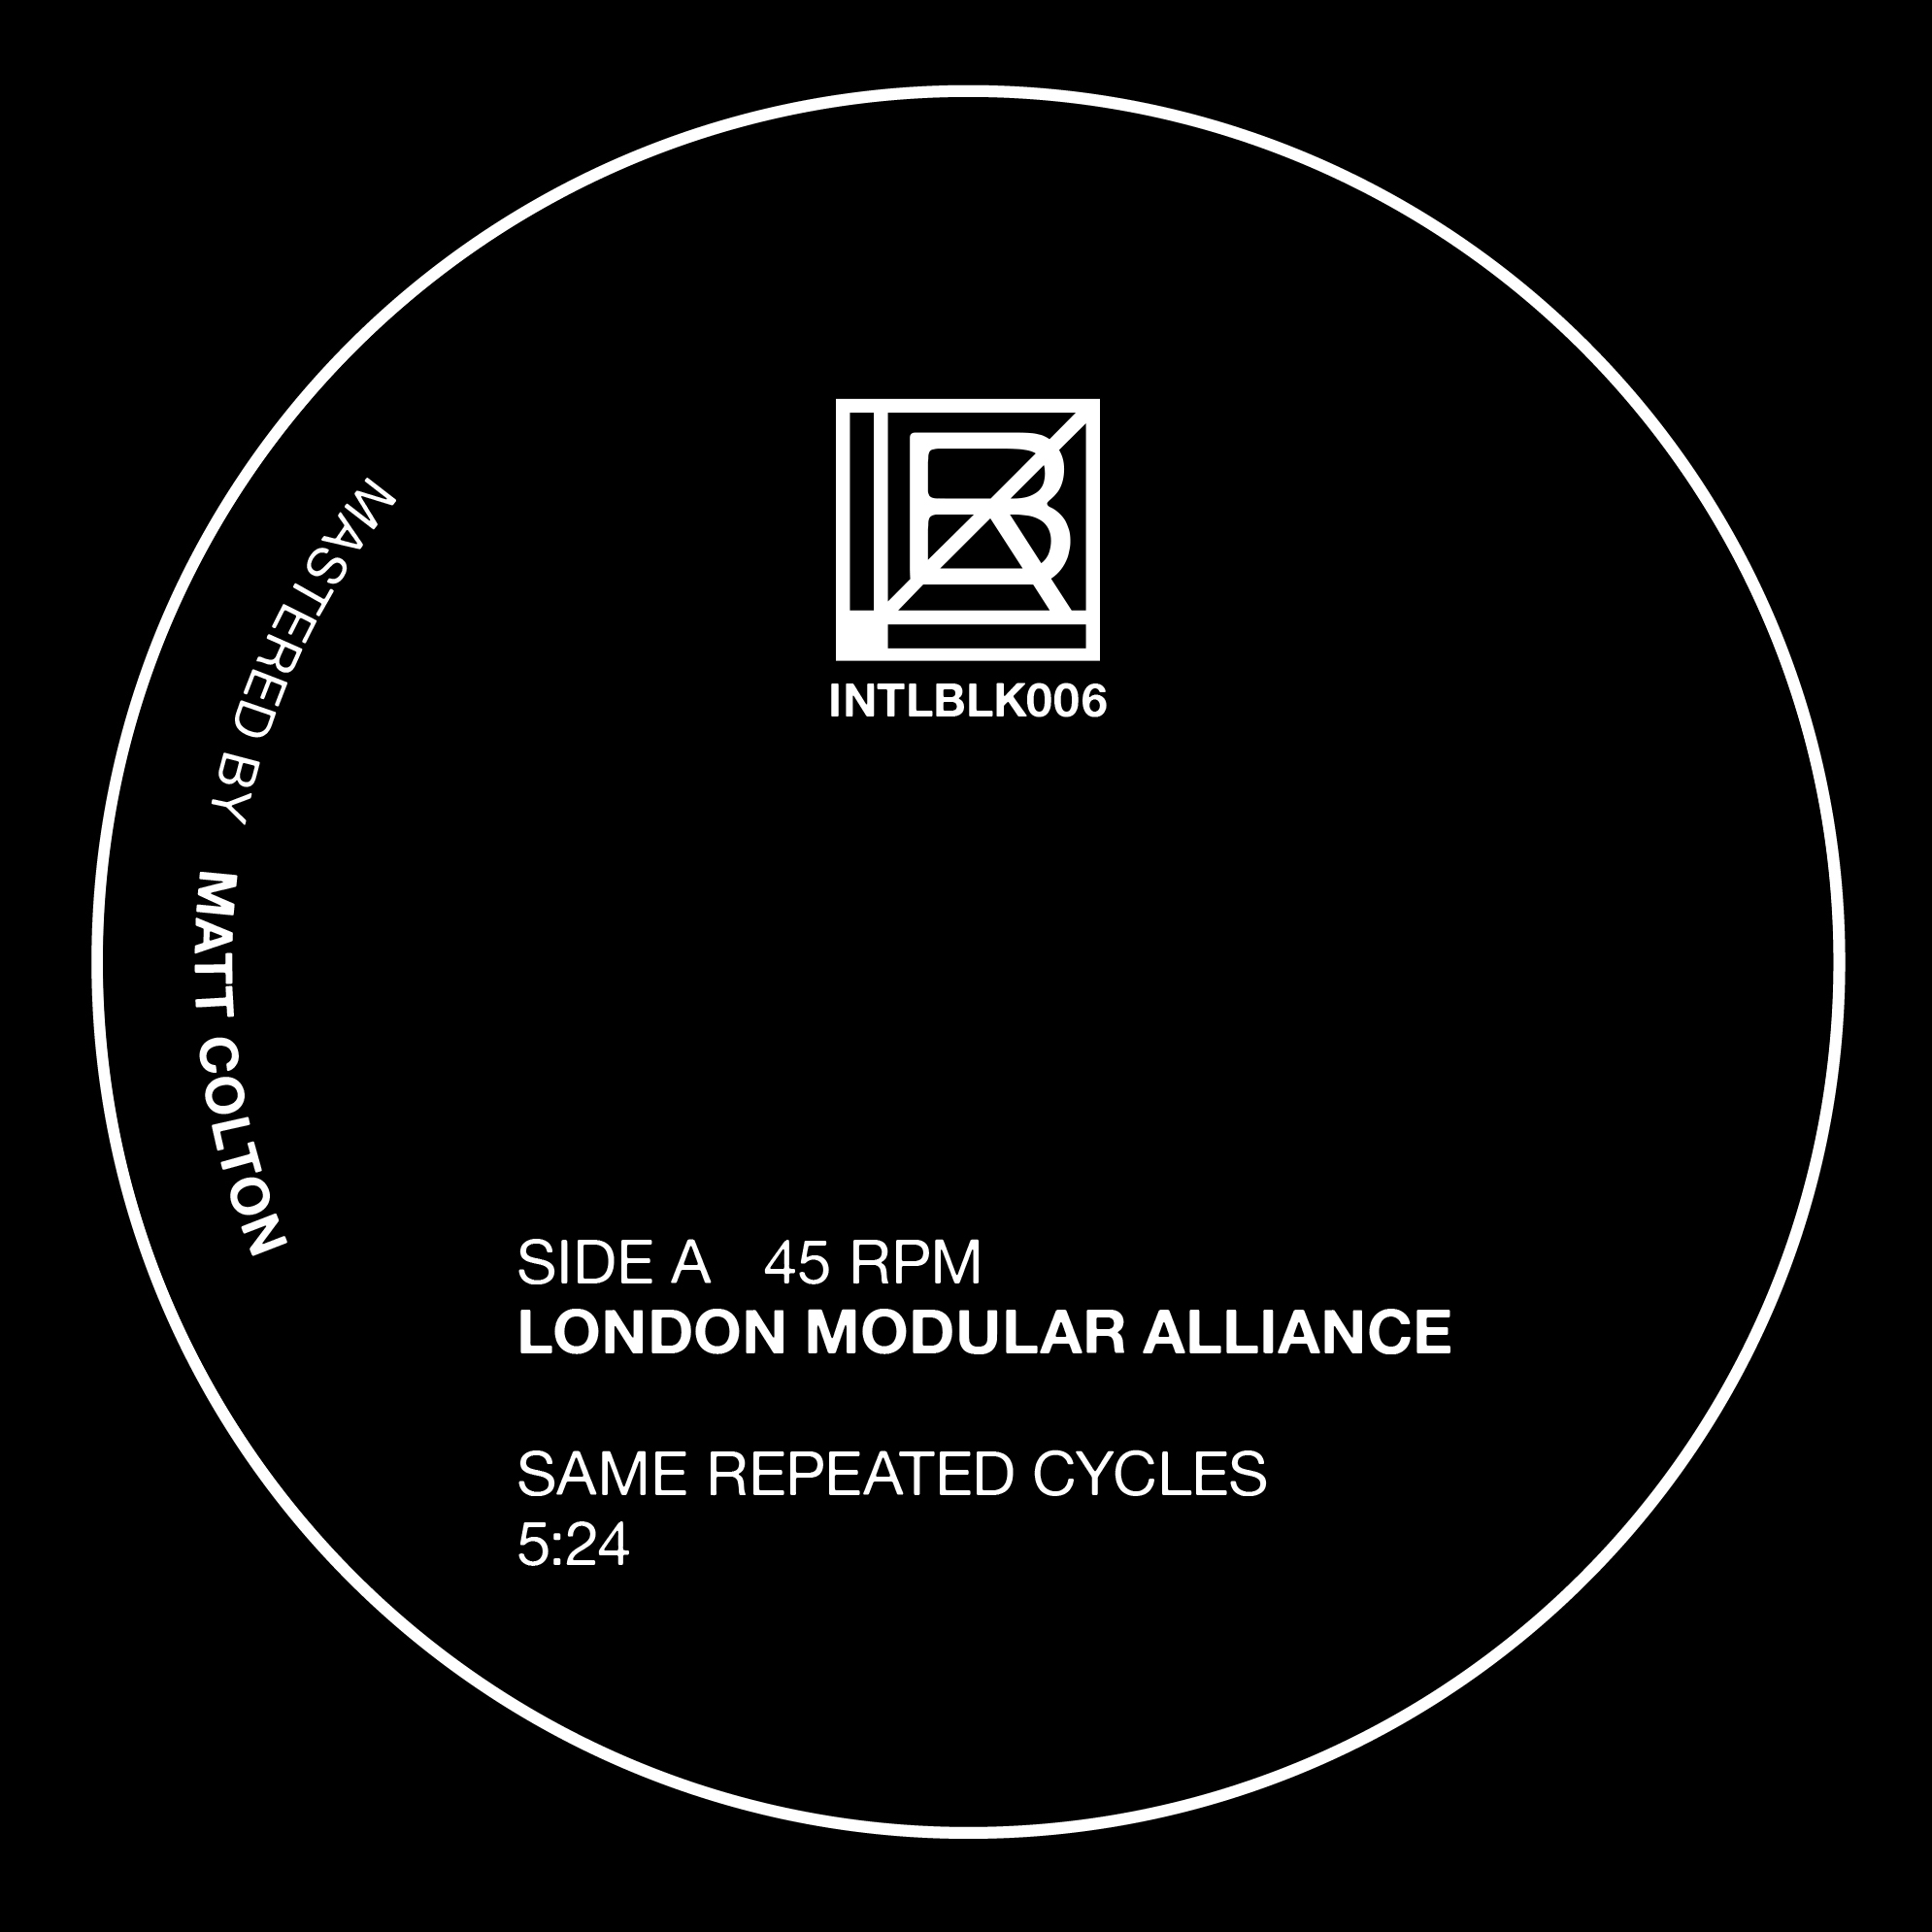 London Modular Alliance debut on International Black with new EP